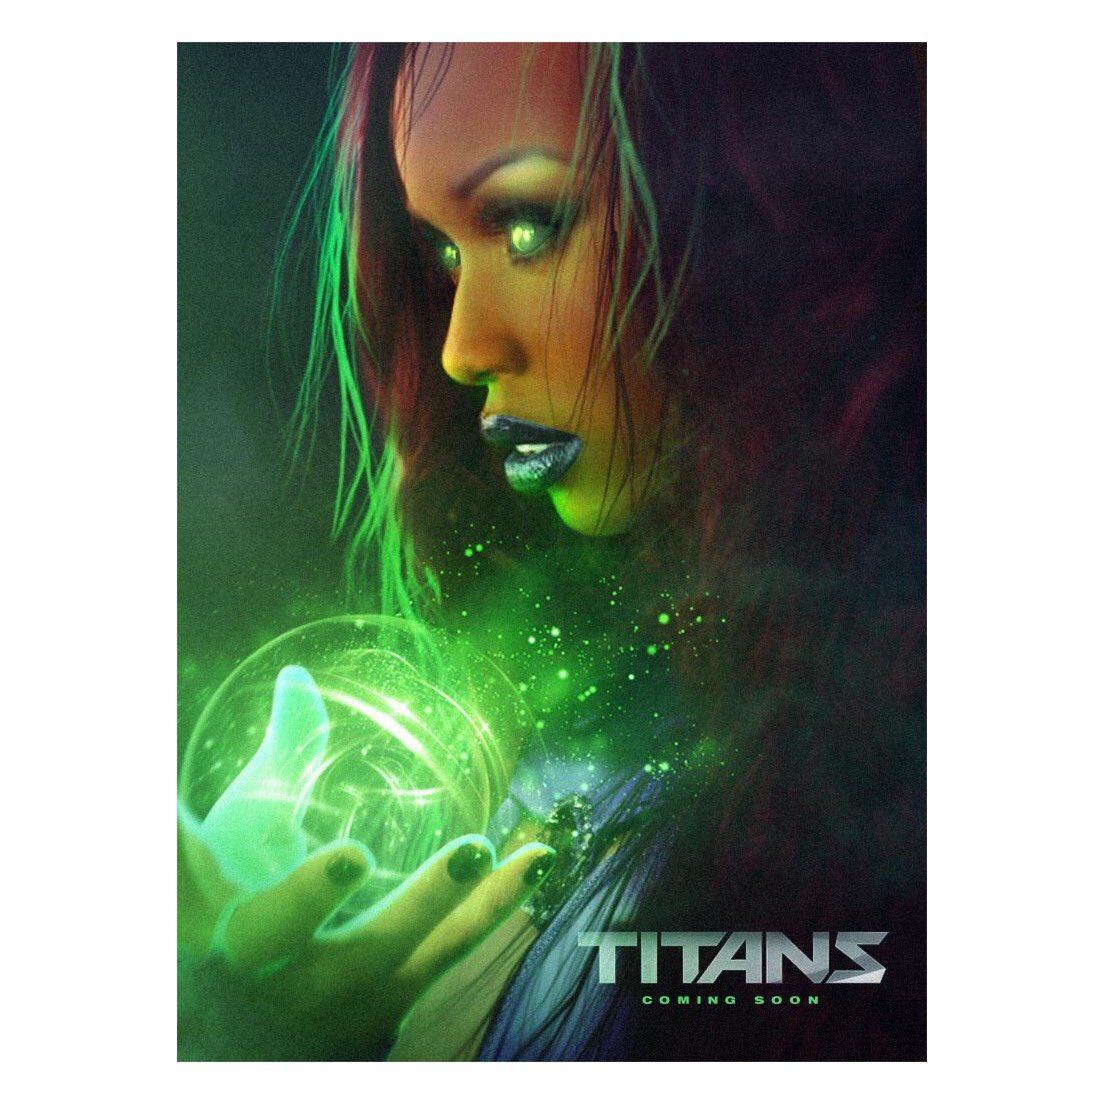 Teen Titans TV Serie - Seite 2 - DC - PaniniComics.de Forum